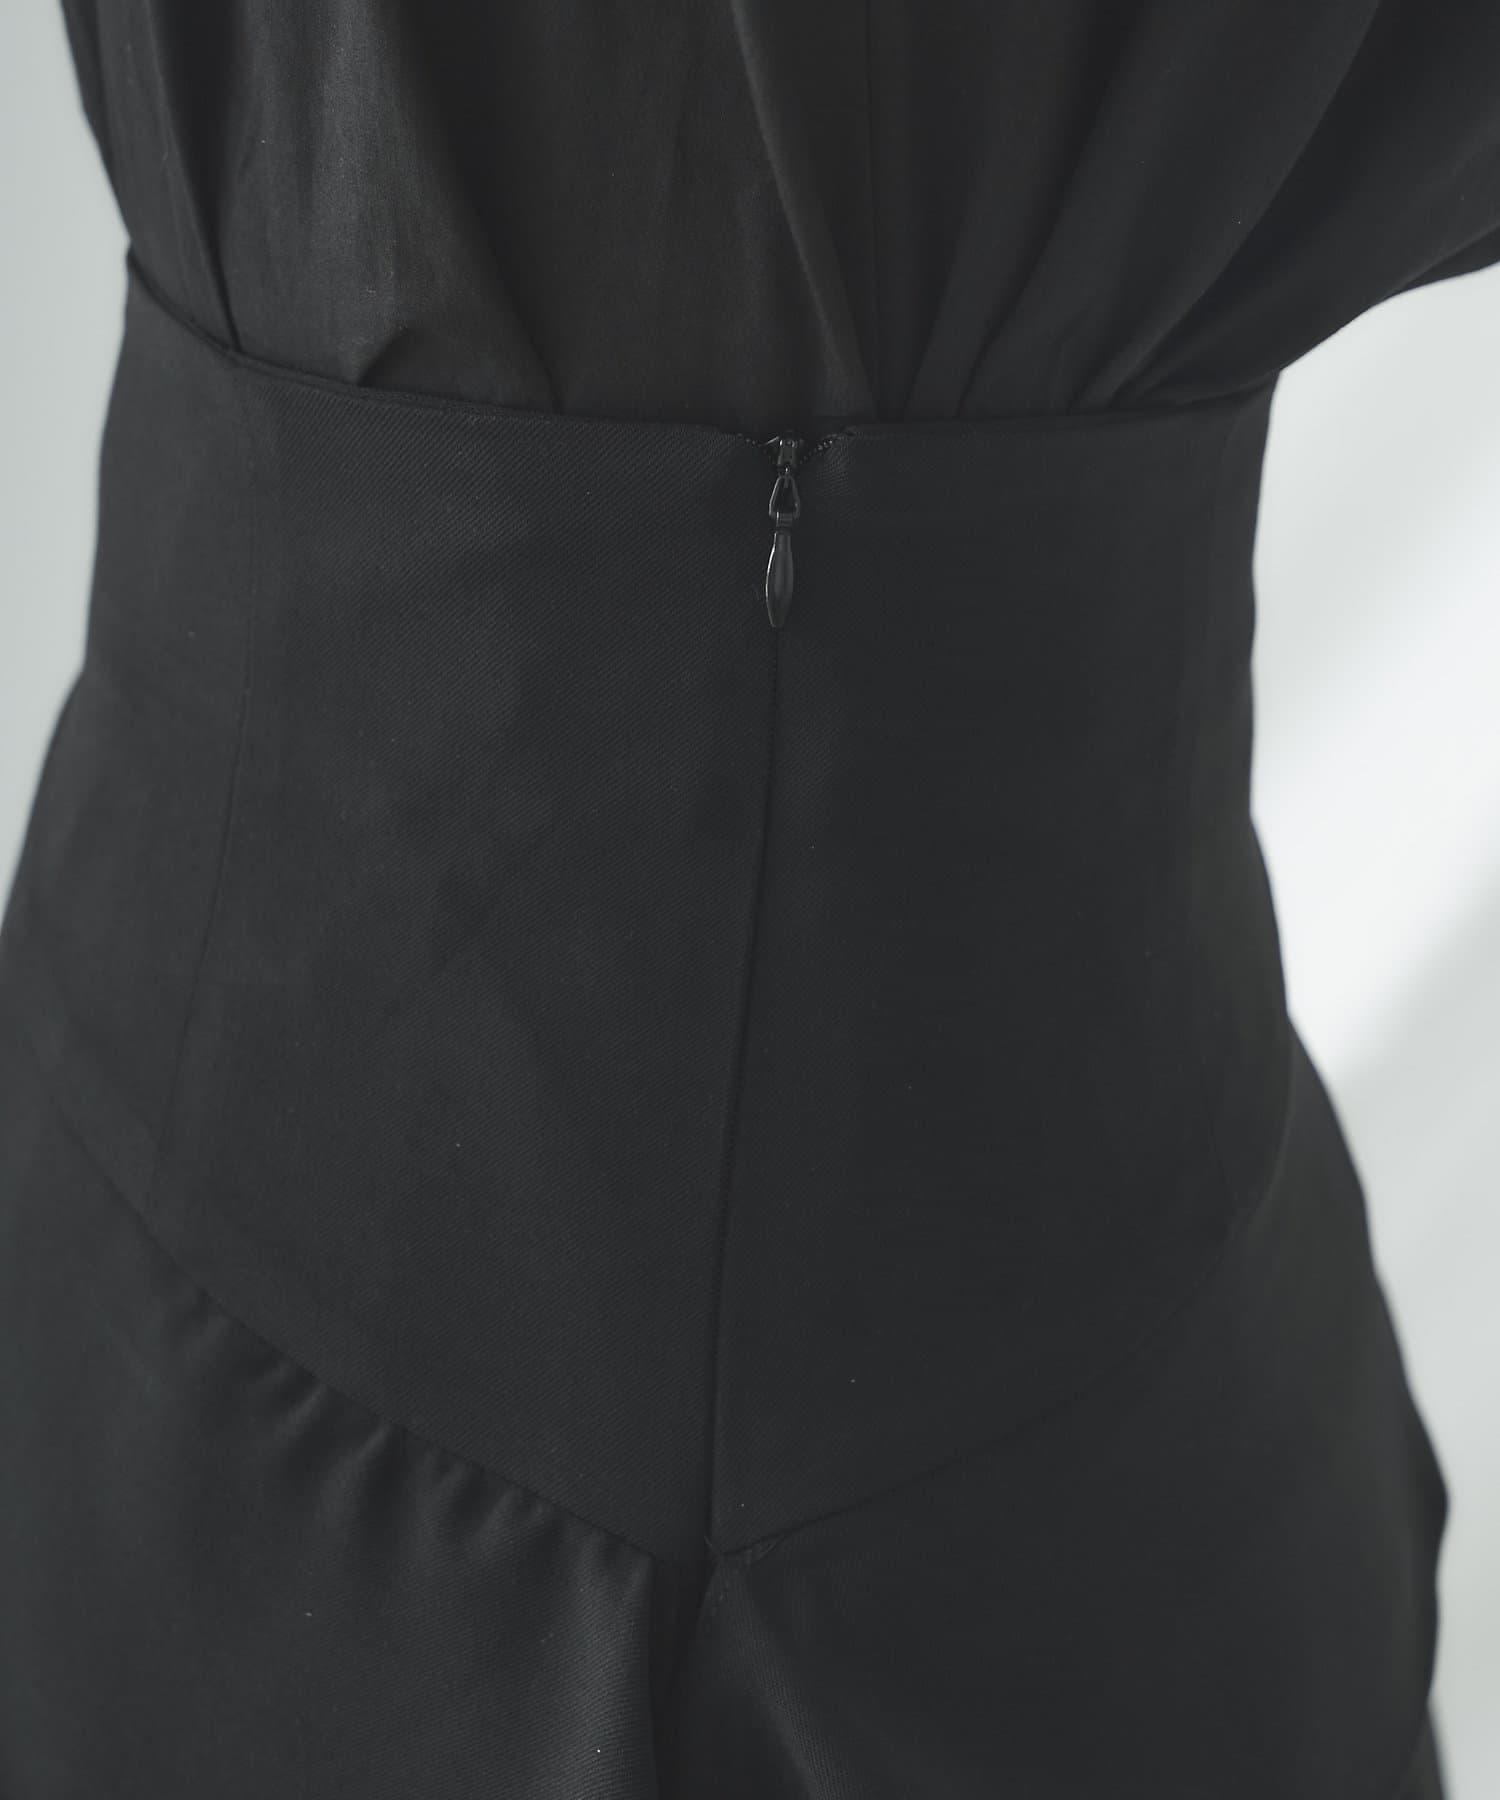 mona Belinda(モナ ベリンダ) ナナメフリルスカート